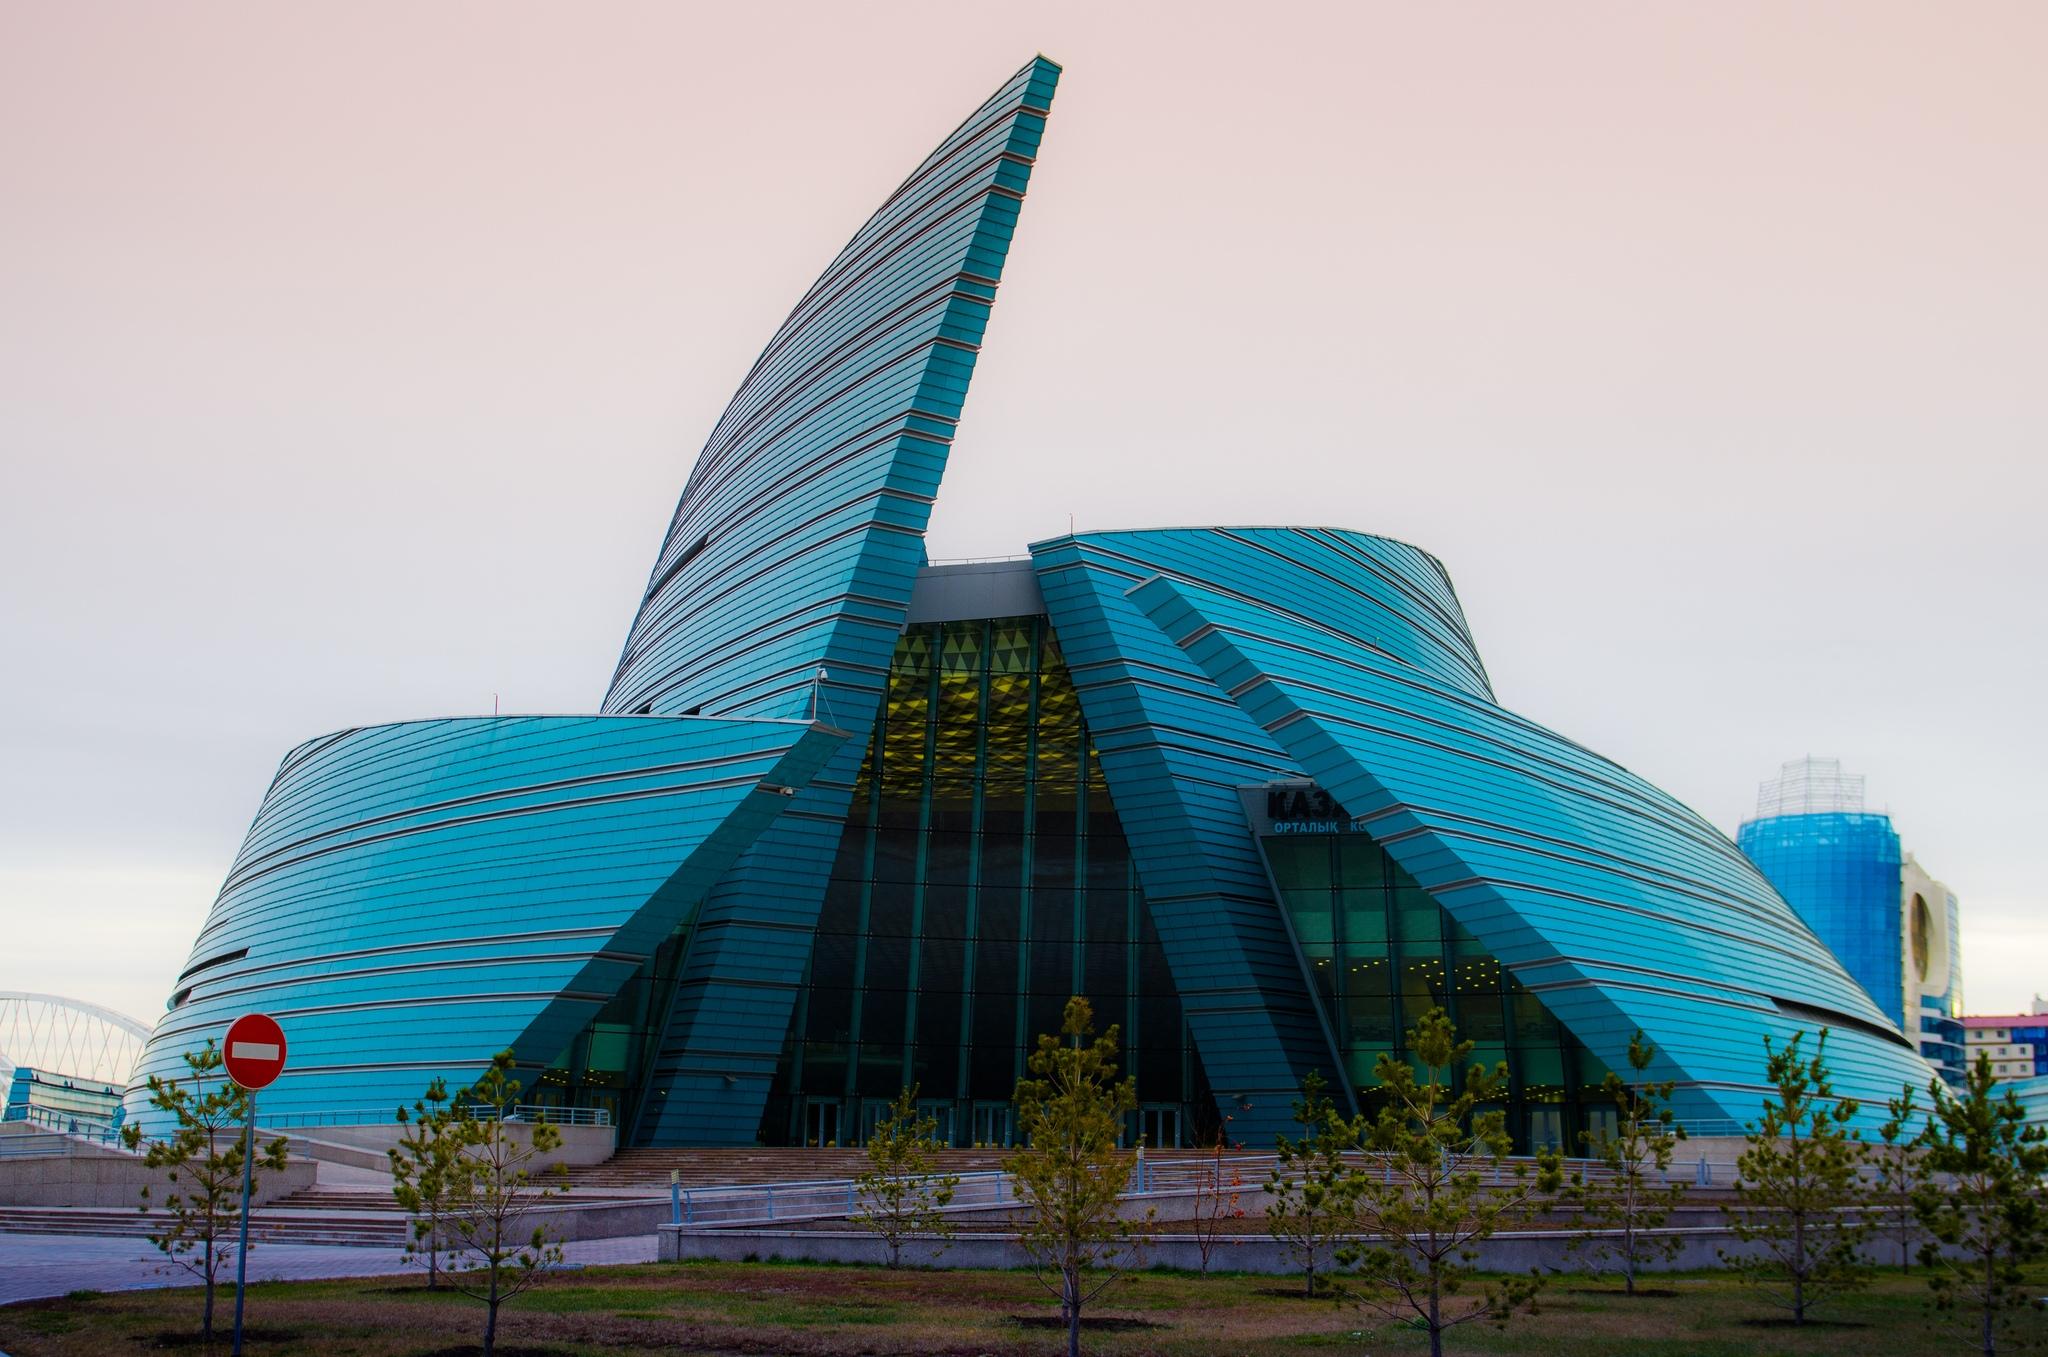 Центральный концертный зал «Казахстан» фото 5